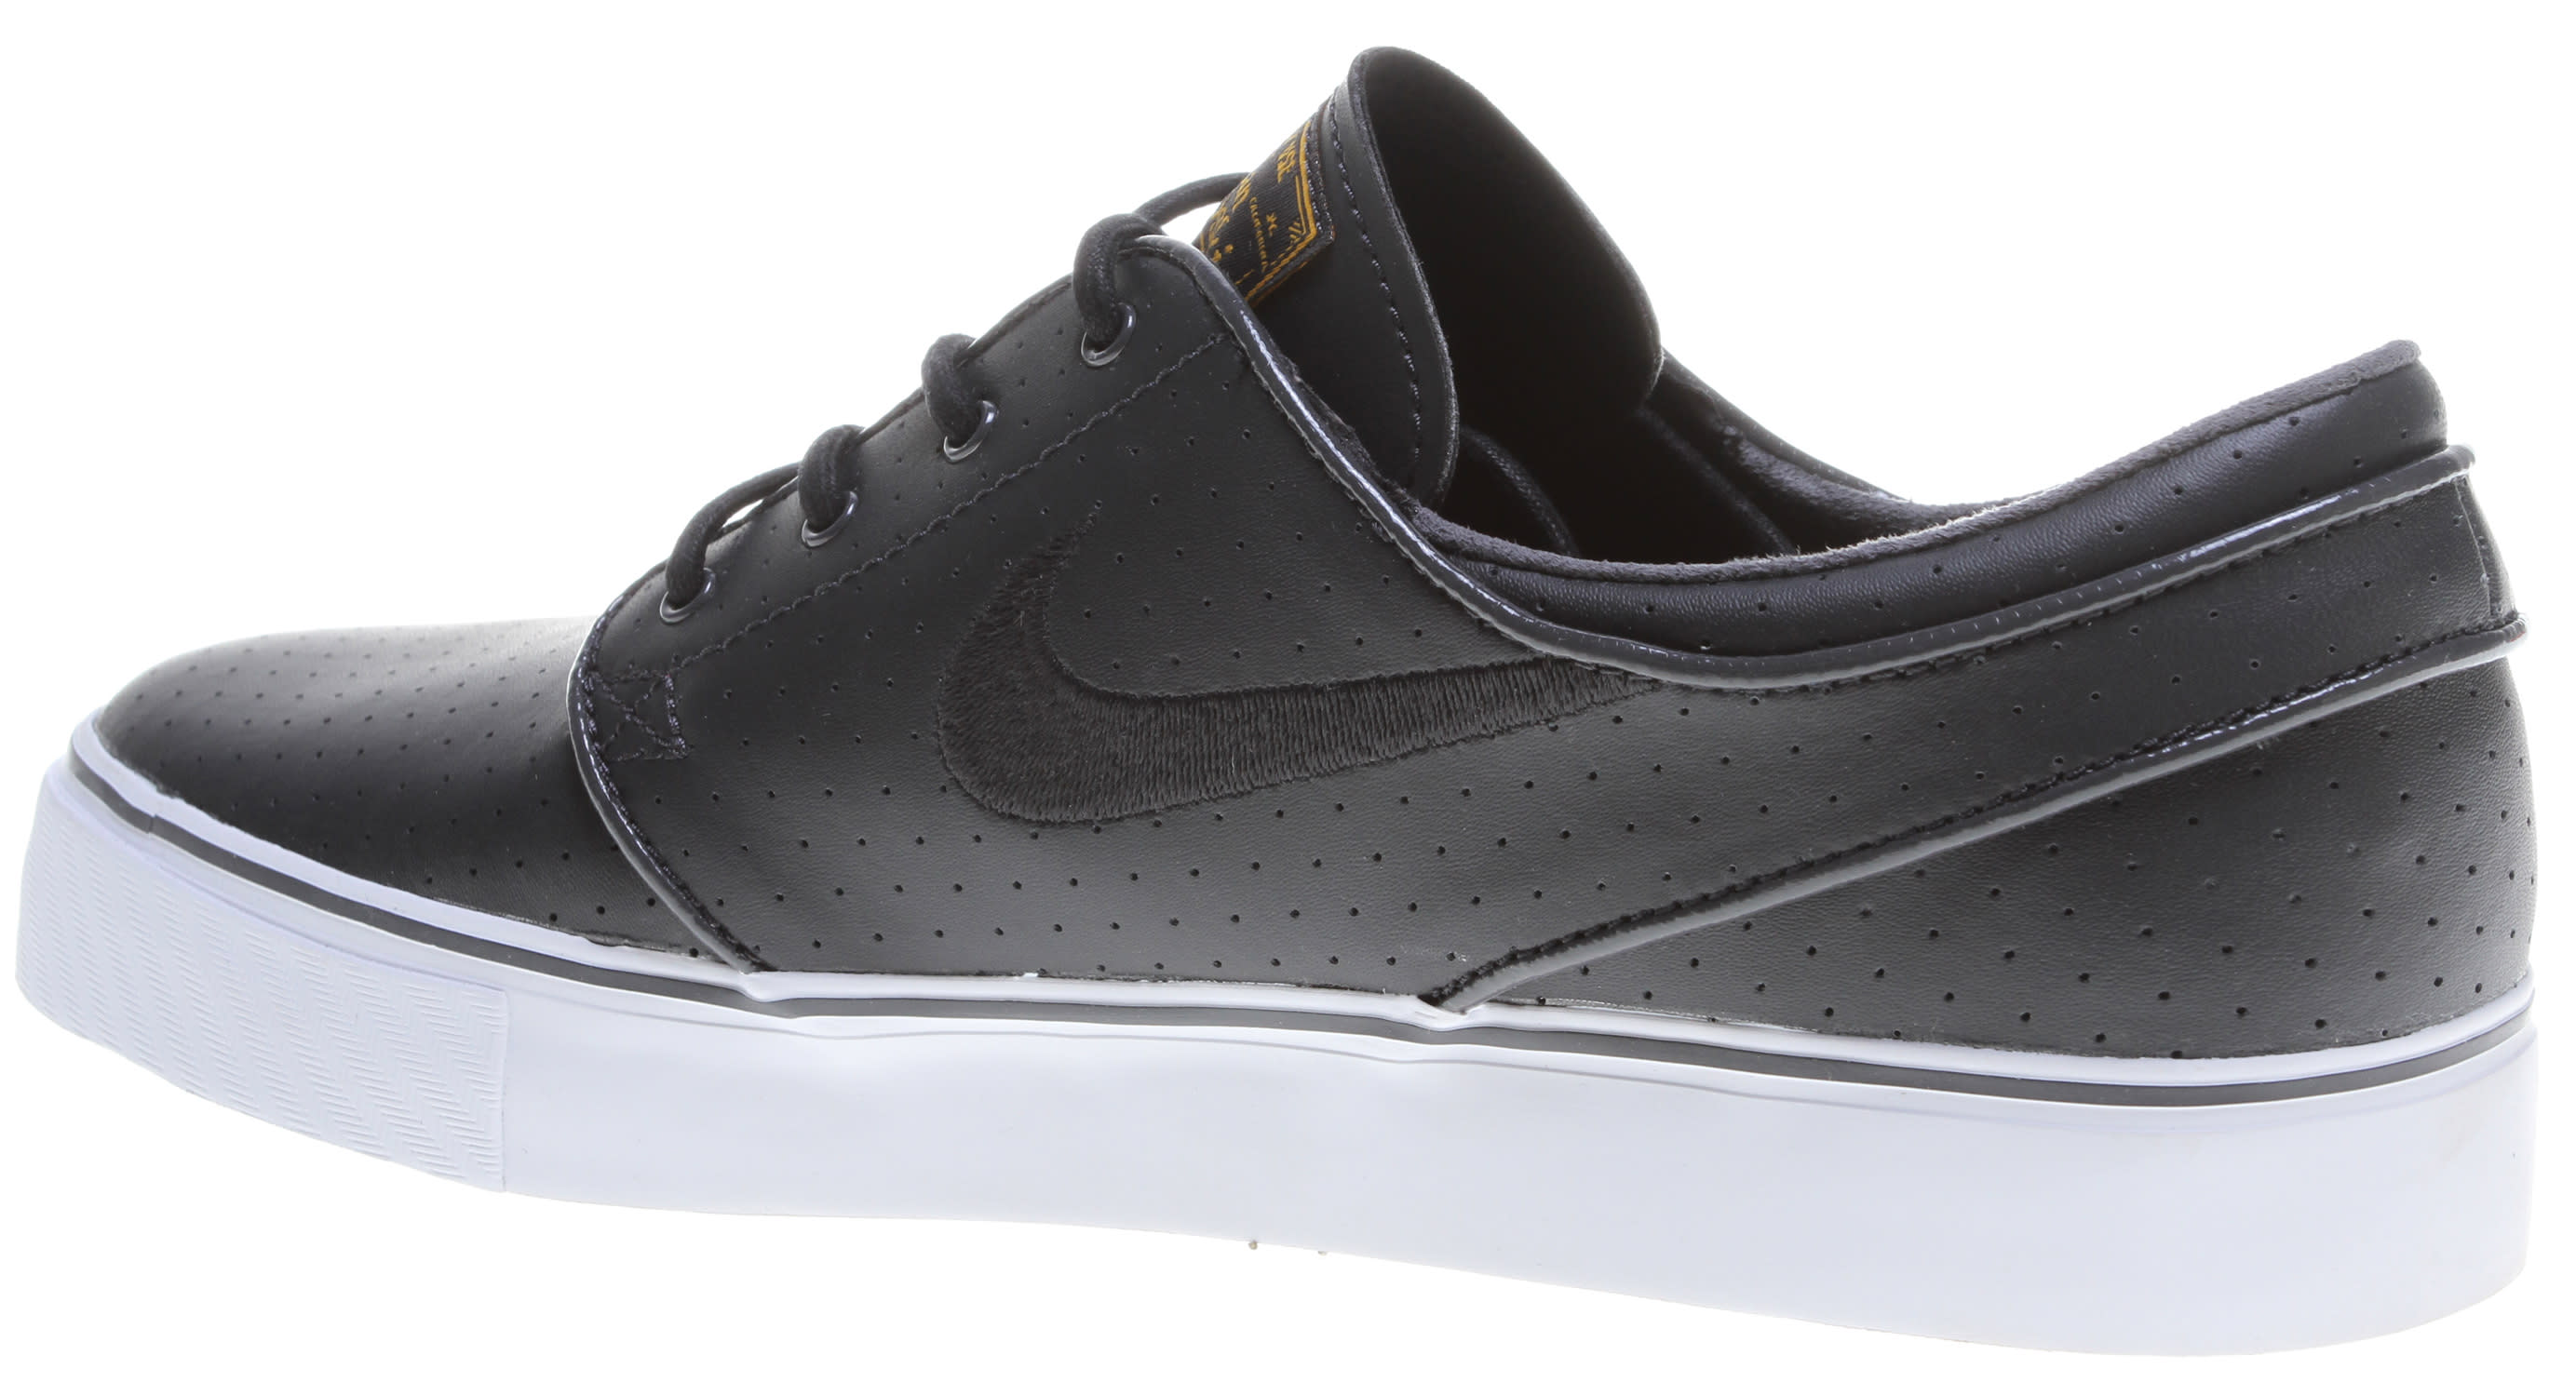 8eb05031bc79 Nike Zoom Stefan Janoski Skate Shoes - thumbnail 3